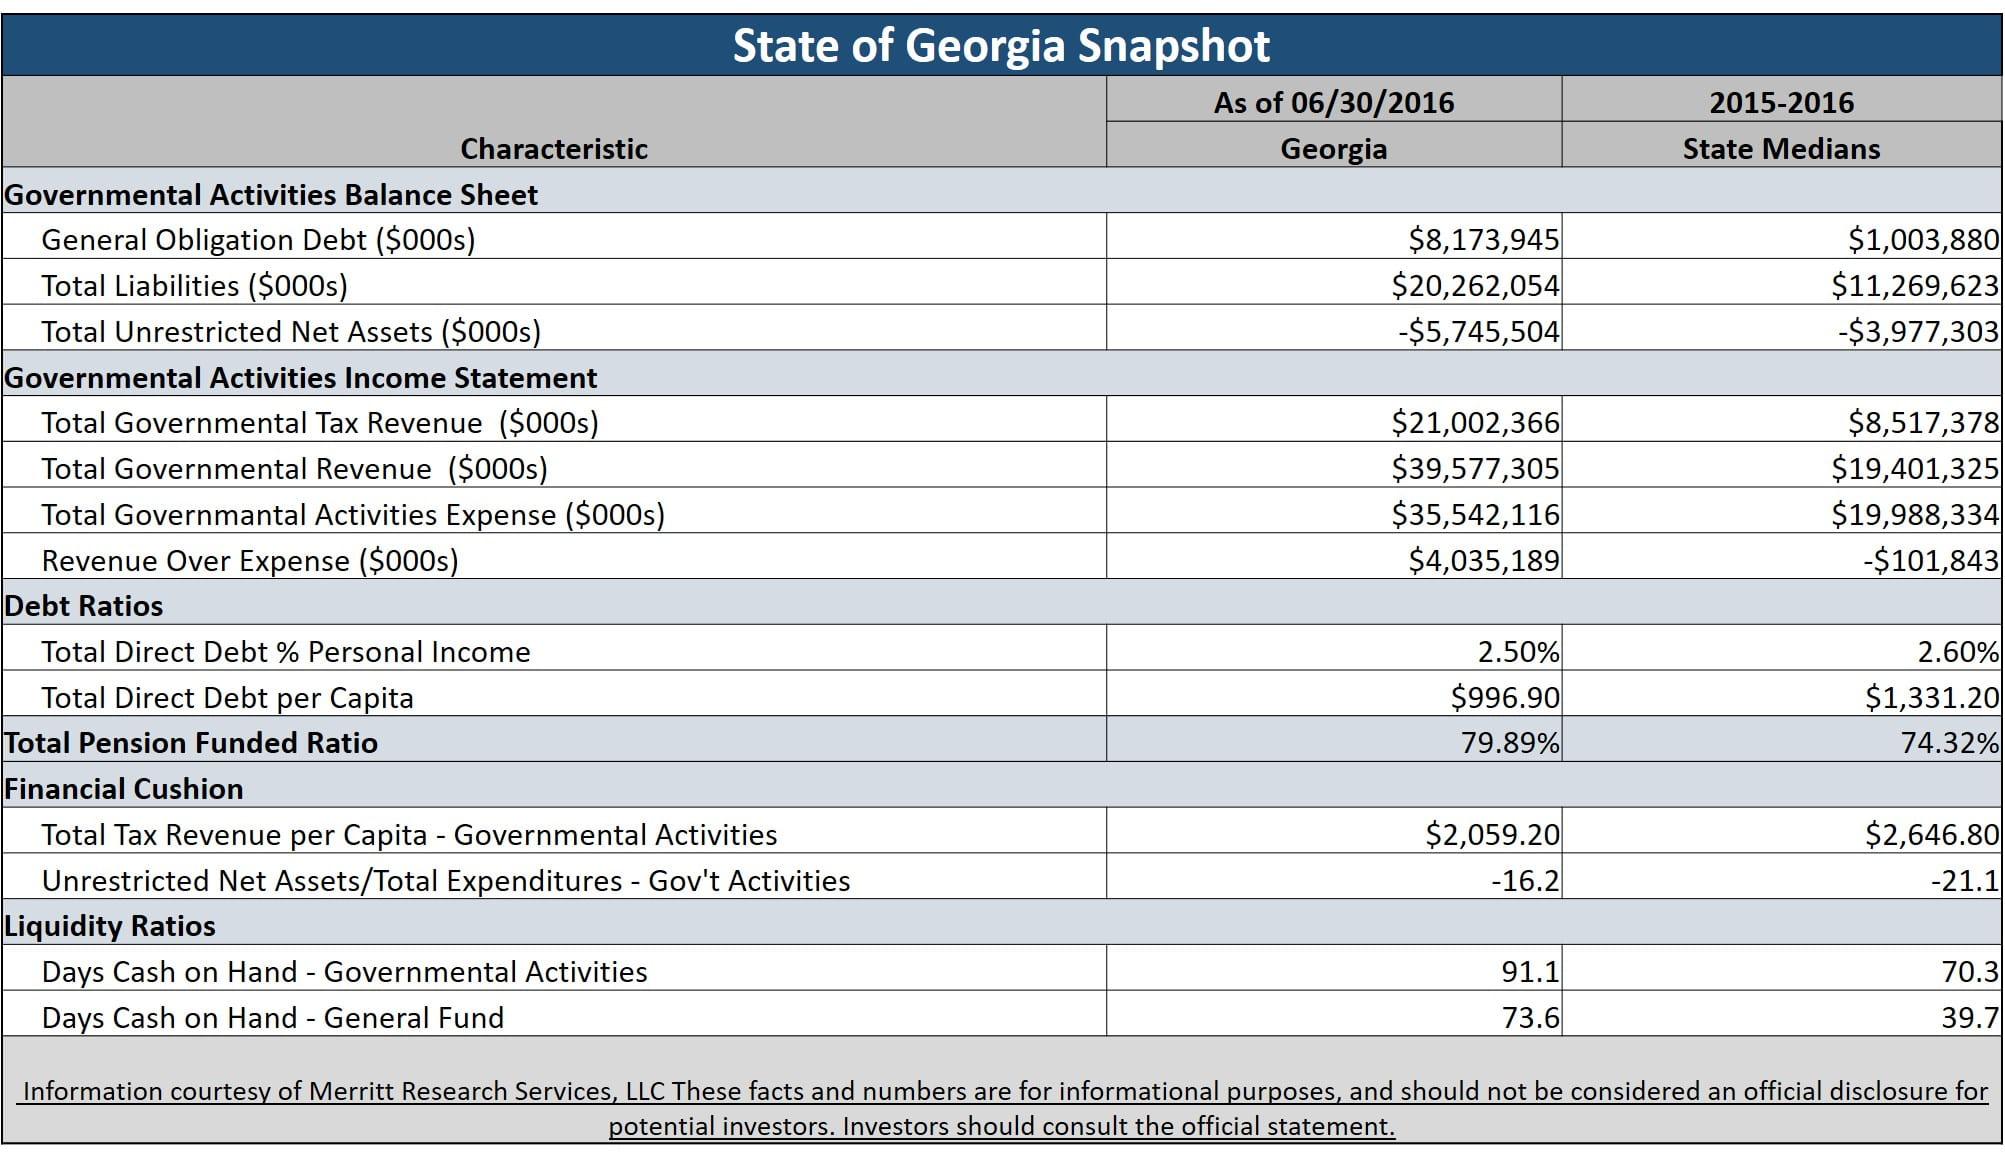 Municipal Bond Featured Snapshot - Georgia